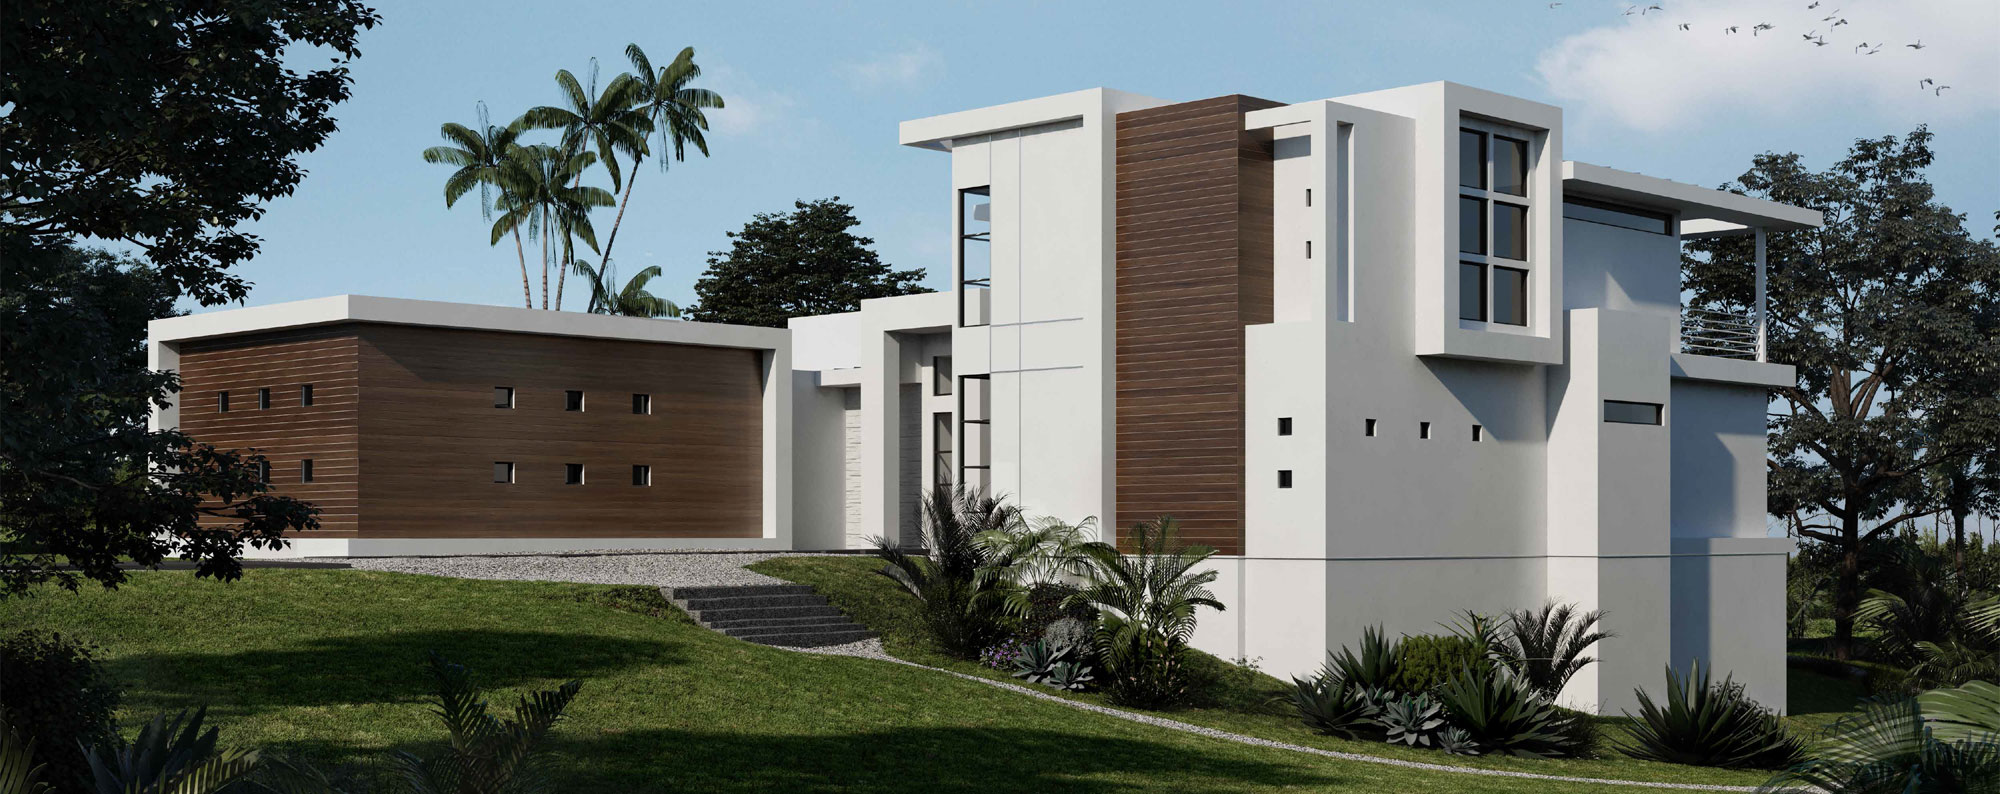 Modern Contemporary Model Home